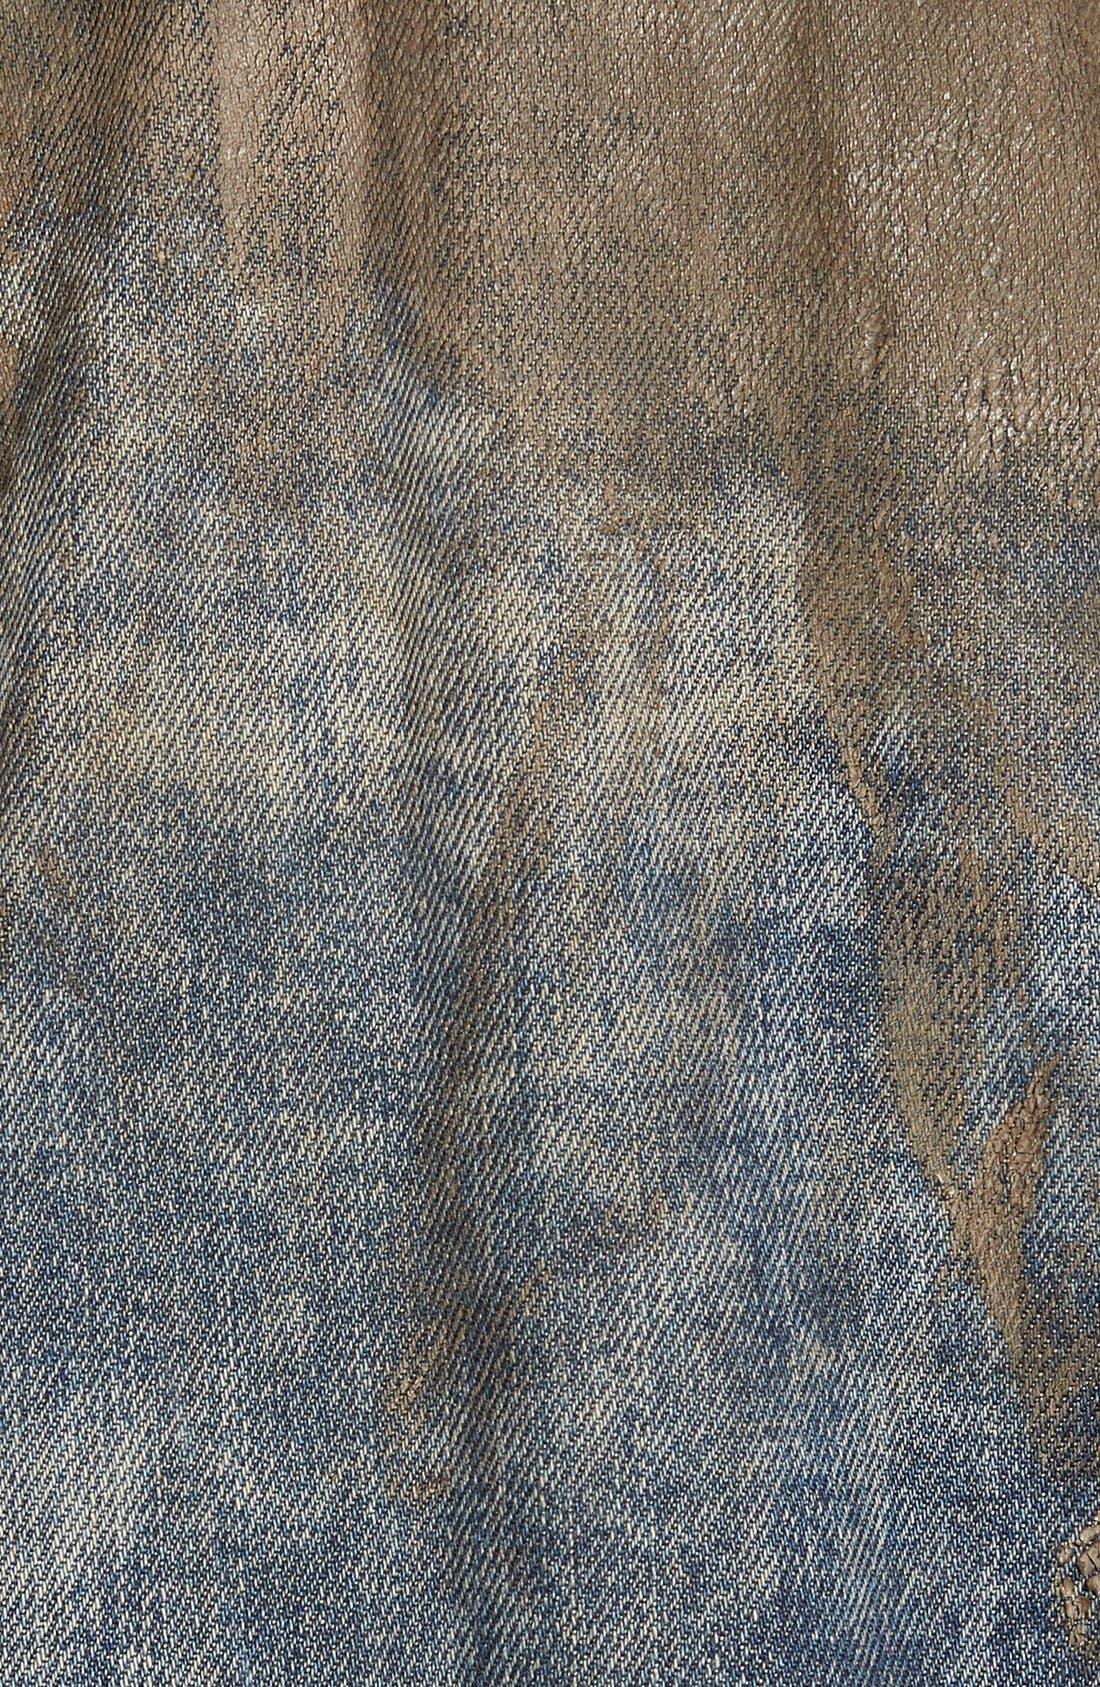 Mud Denim Jacket,                             Alternate thumbnail 4, color,                             490